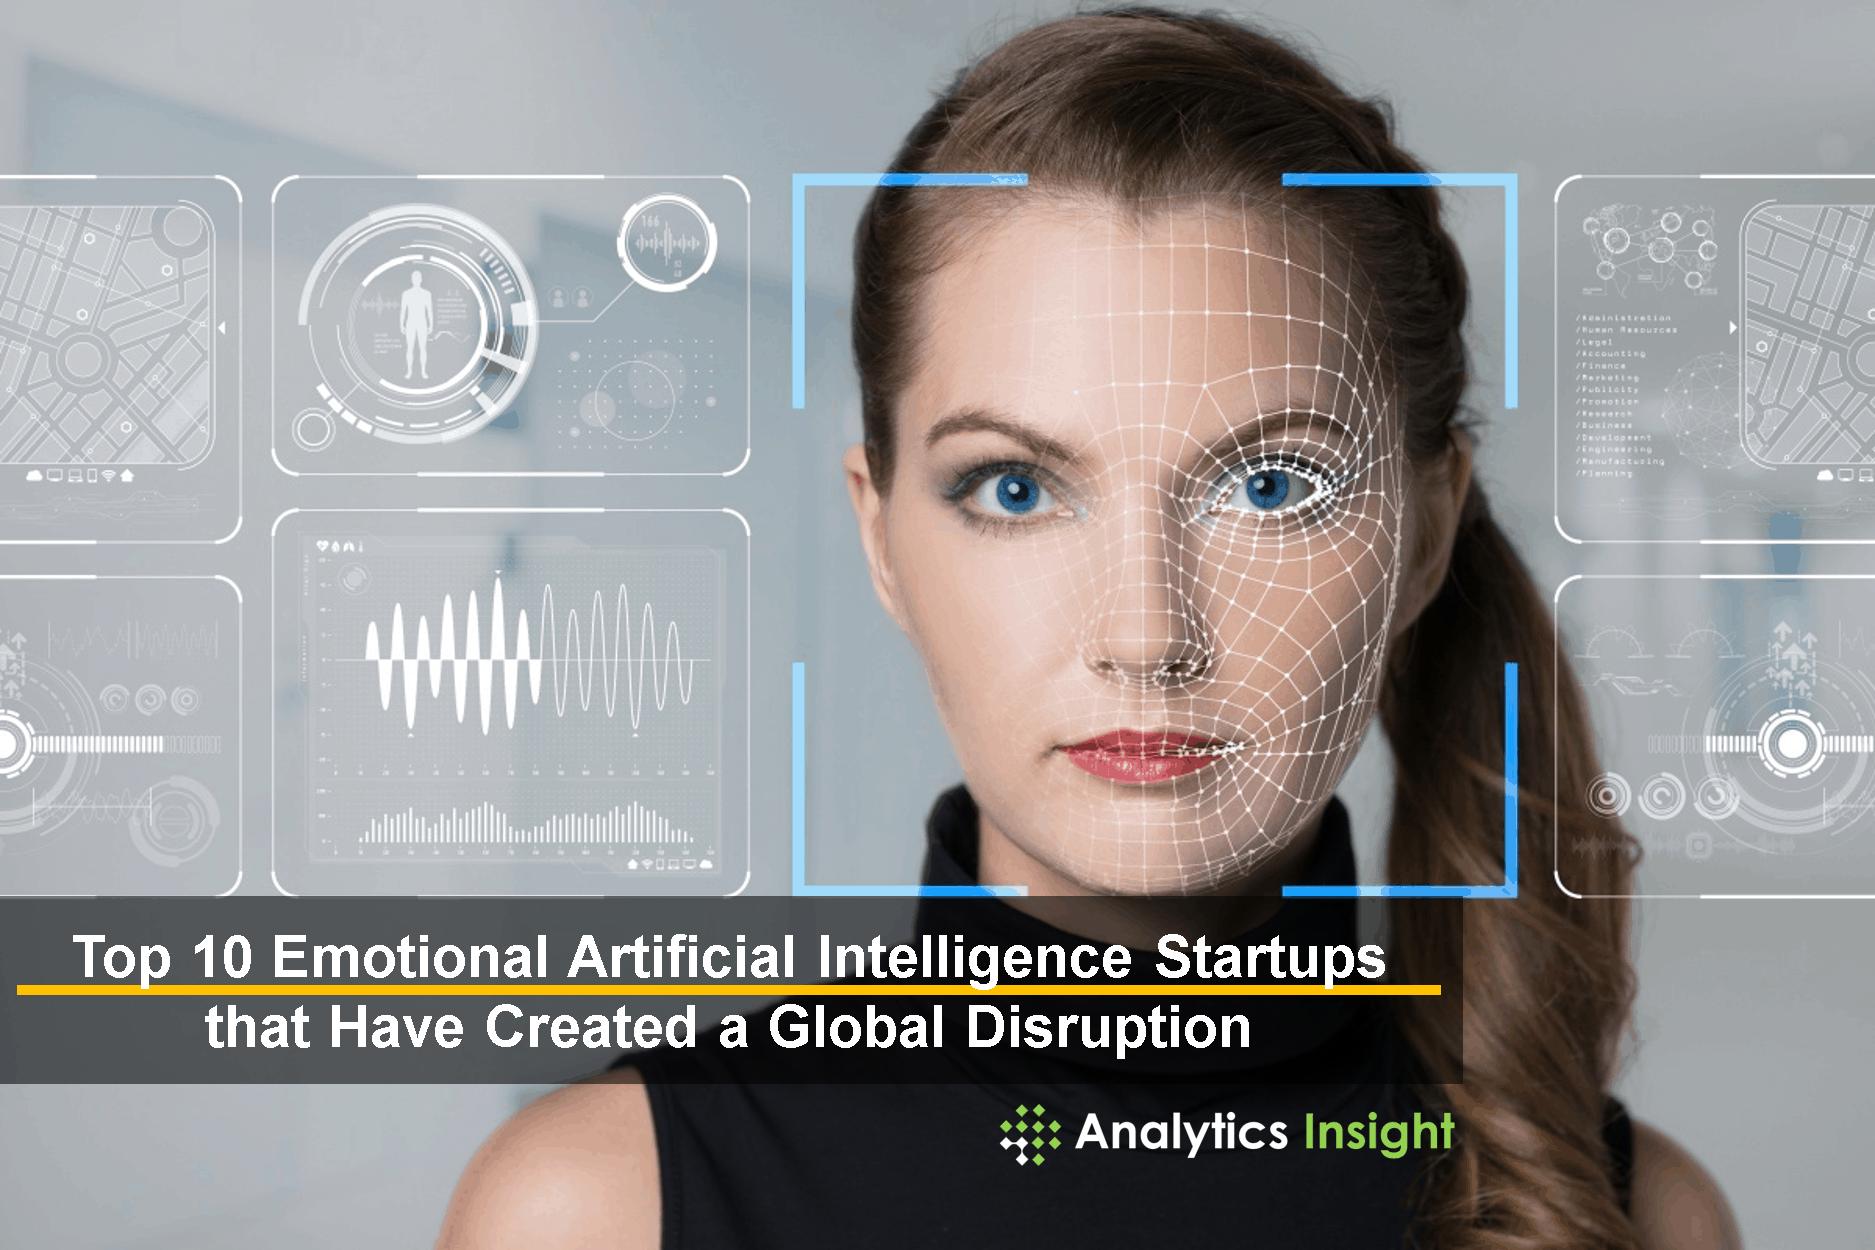 Emotional Artificial Intelligence